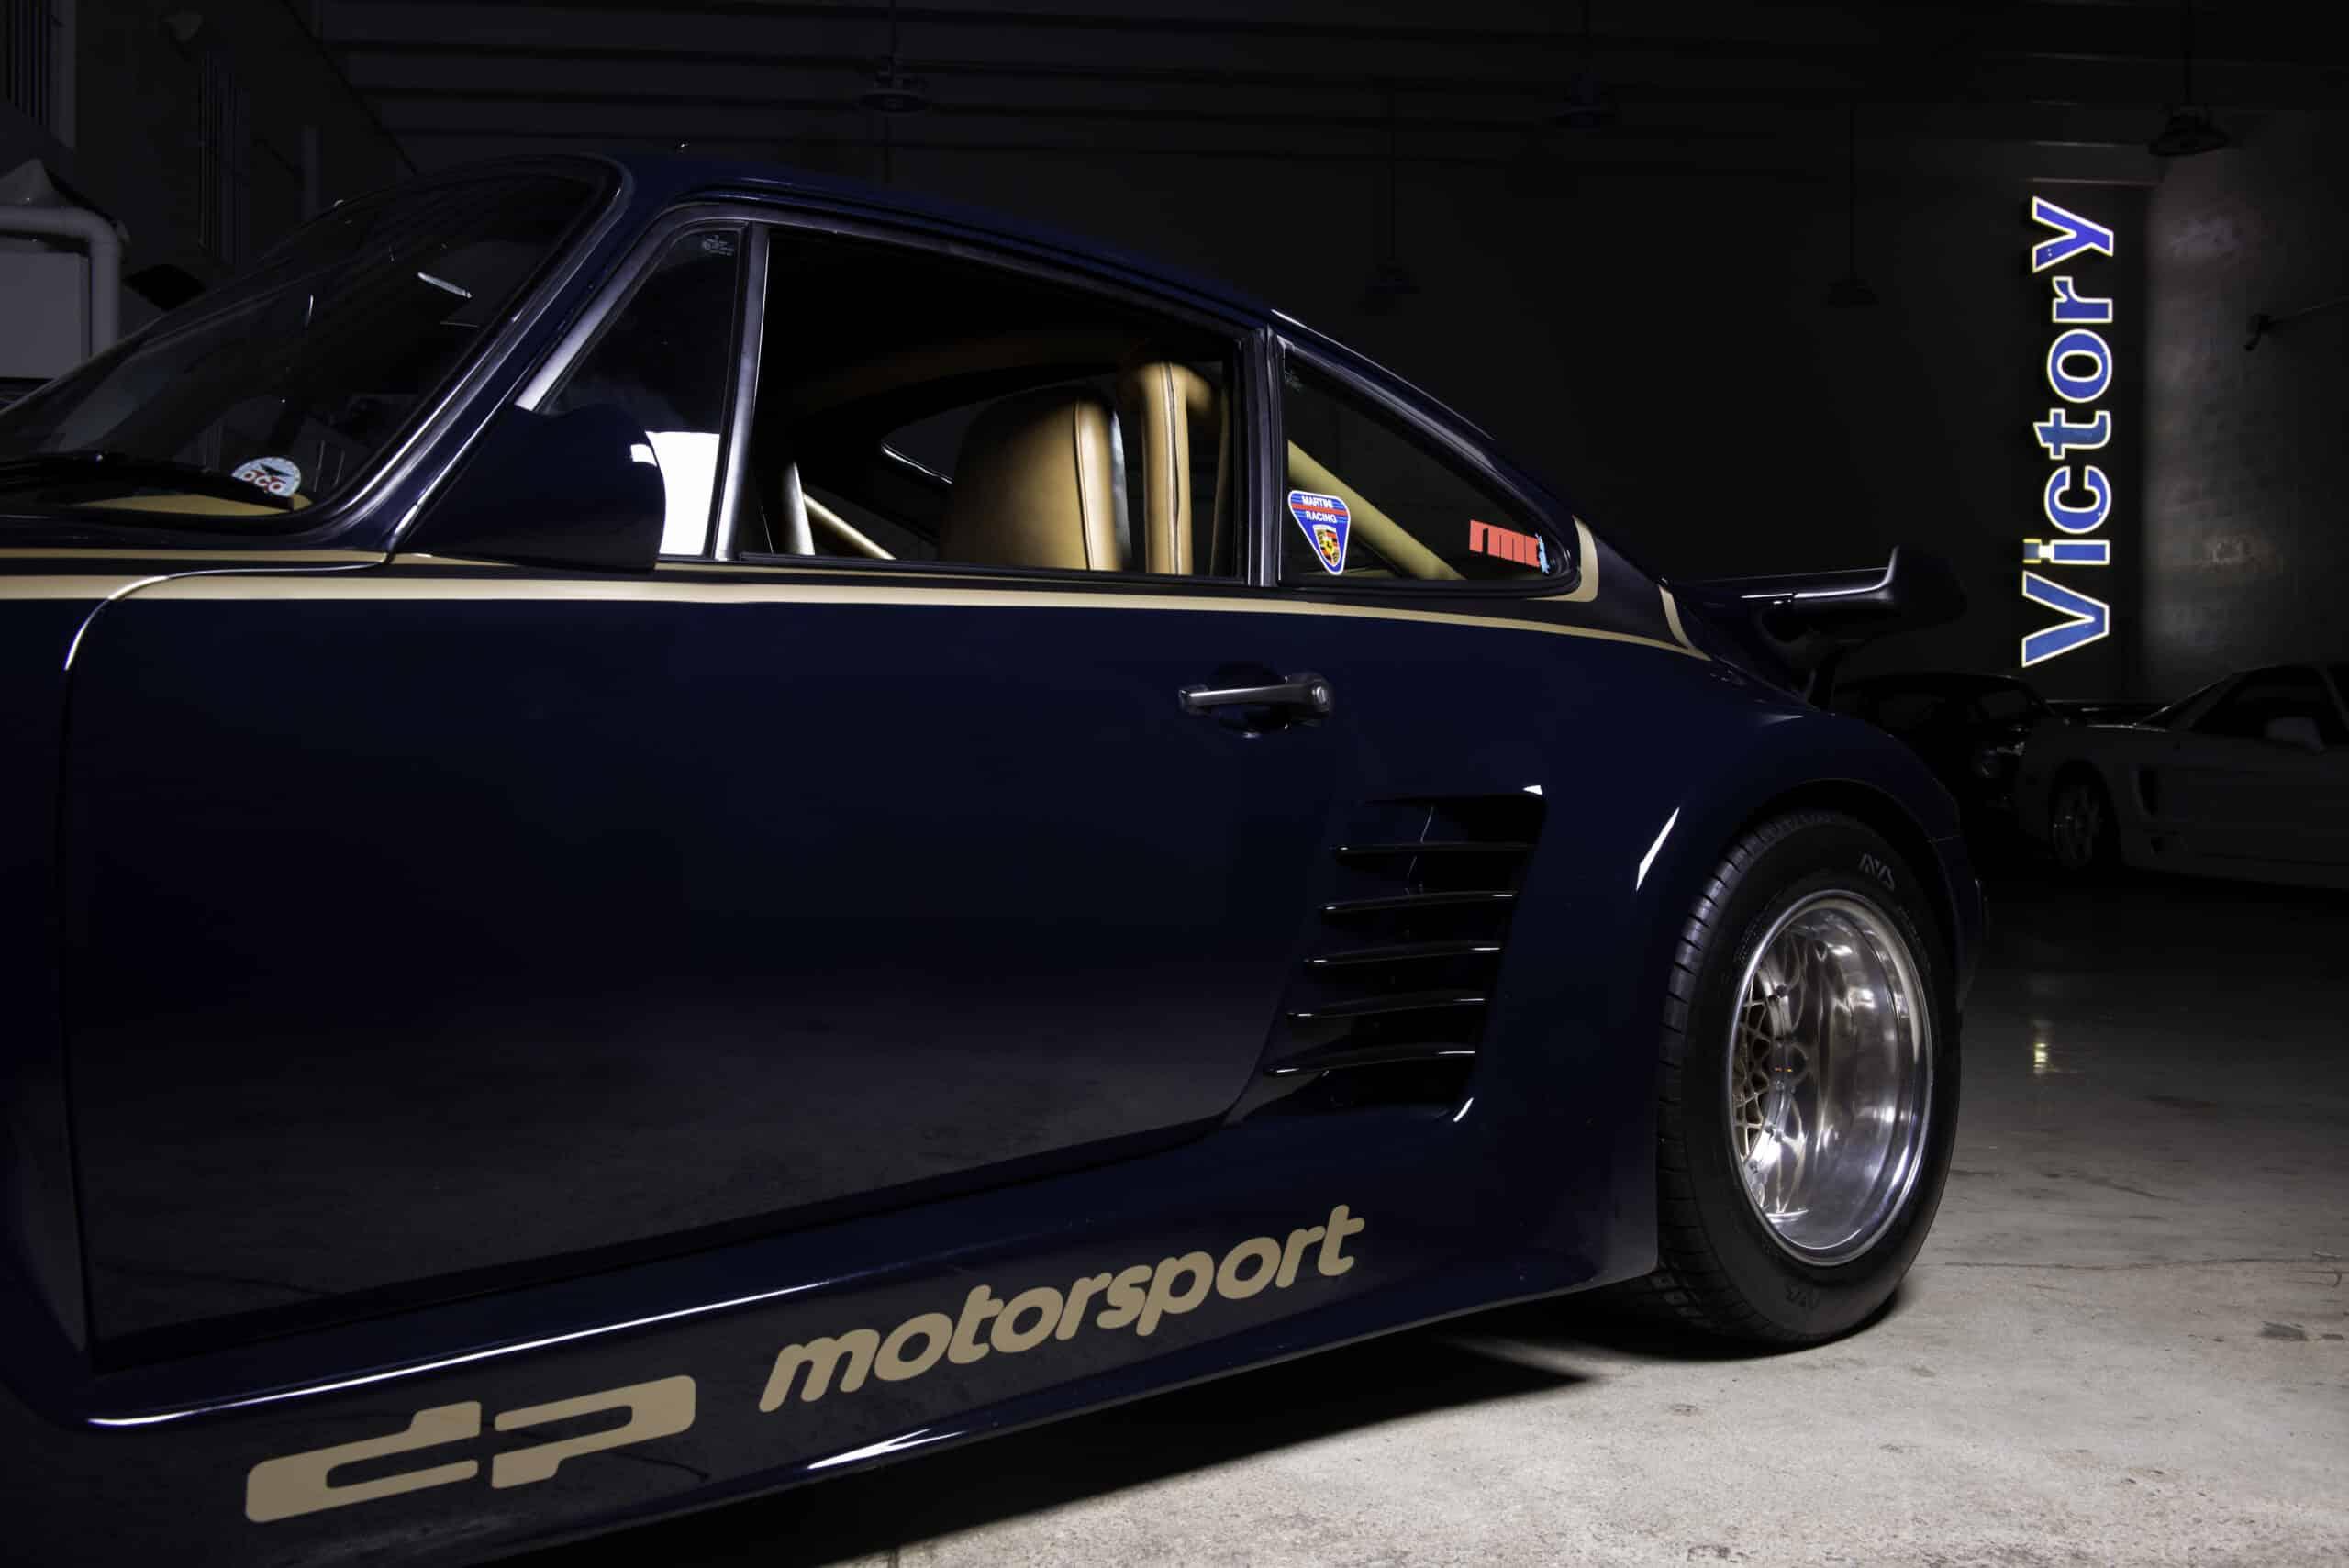 1985 Porsche Turbo 935/930 DP Motorsport dp Motorsport / Kremer 935 TURBO built for MARIO ANDRETTI